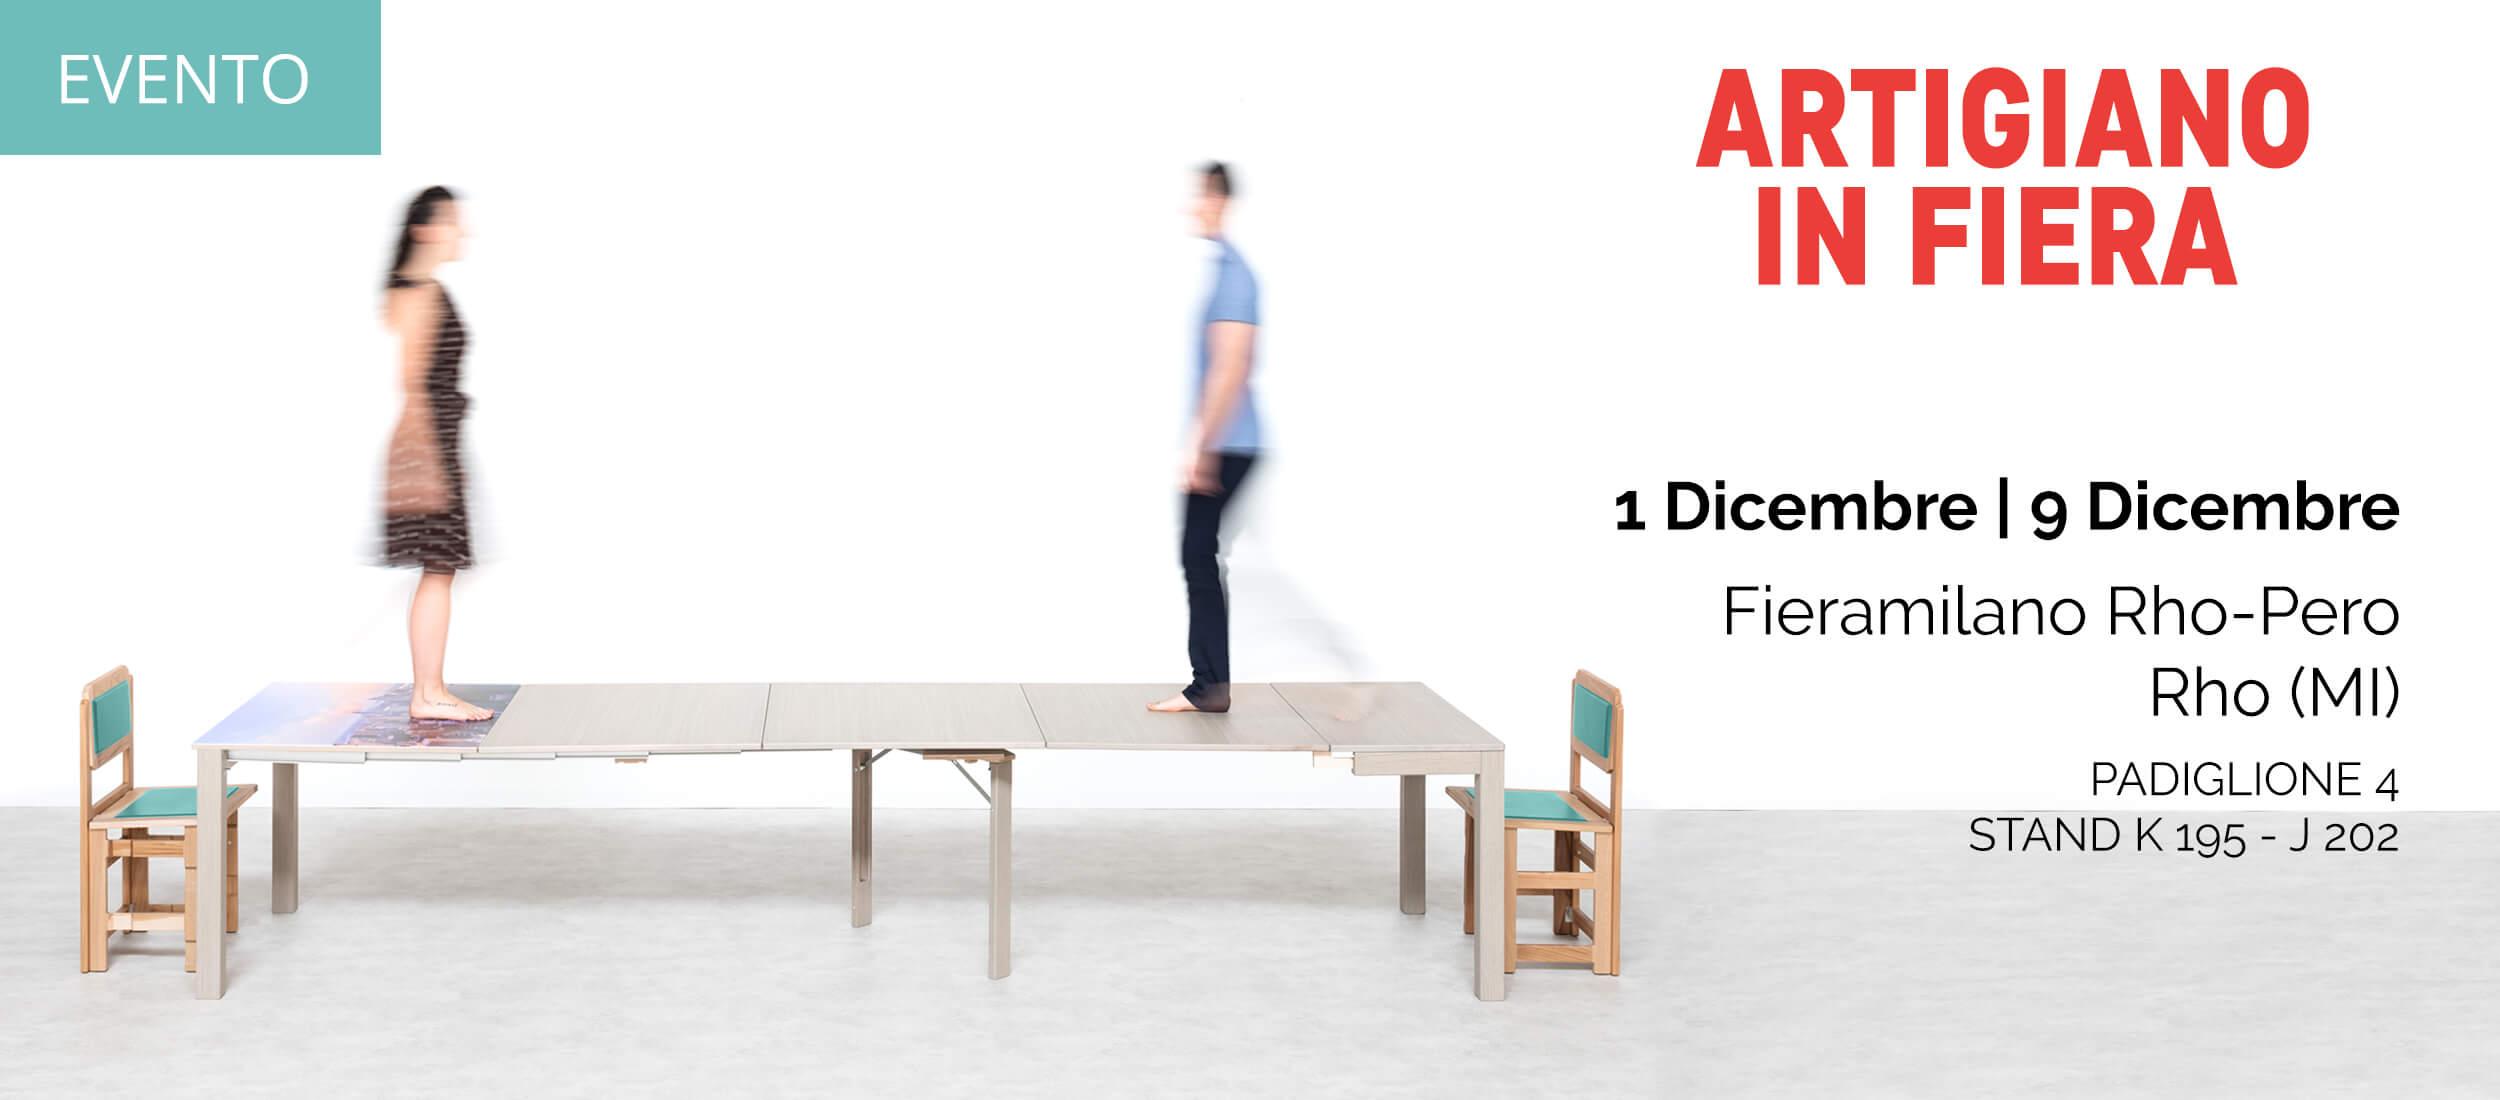 tavoli-allungabili-artigiano-in-fiera-2018-desktop